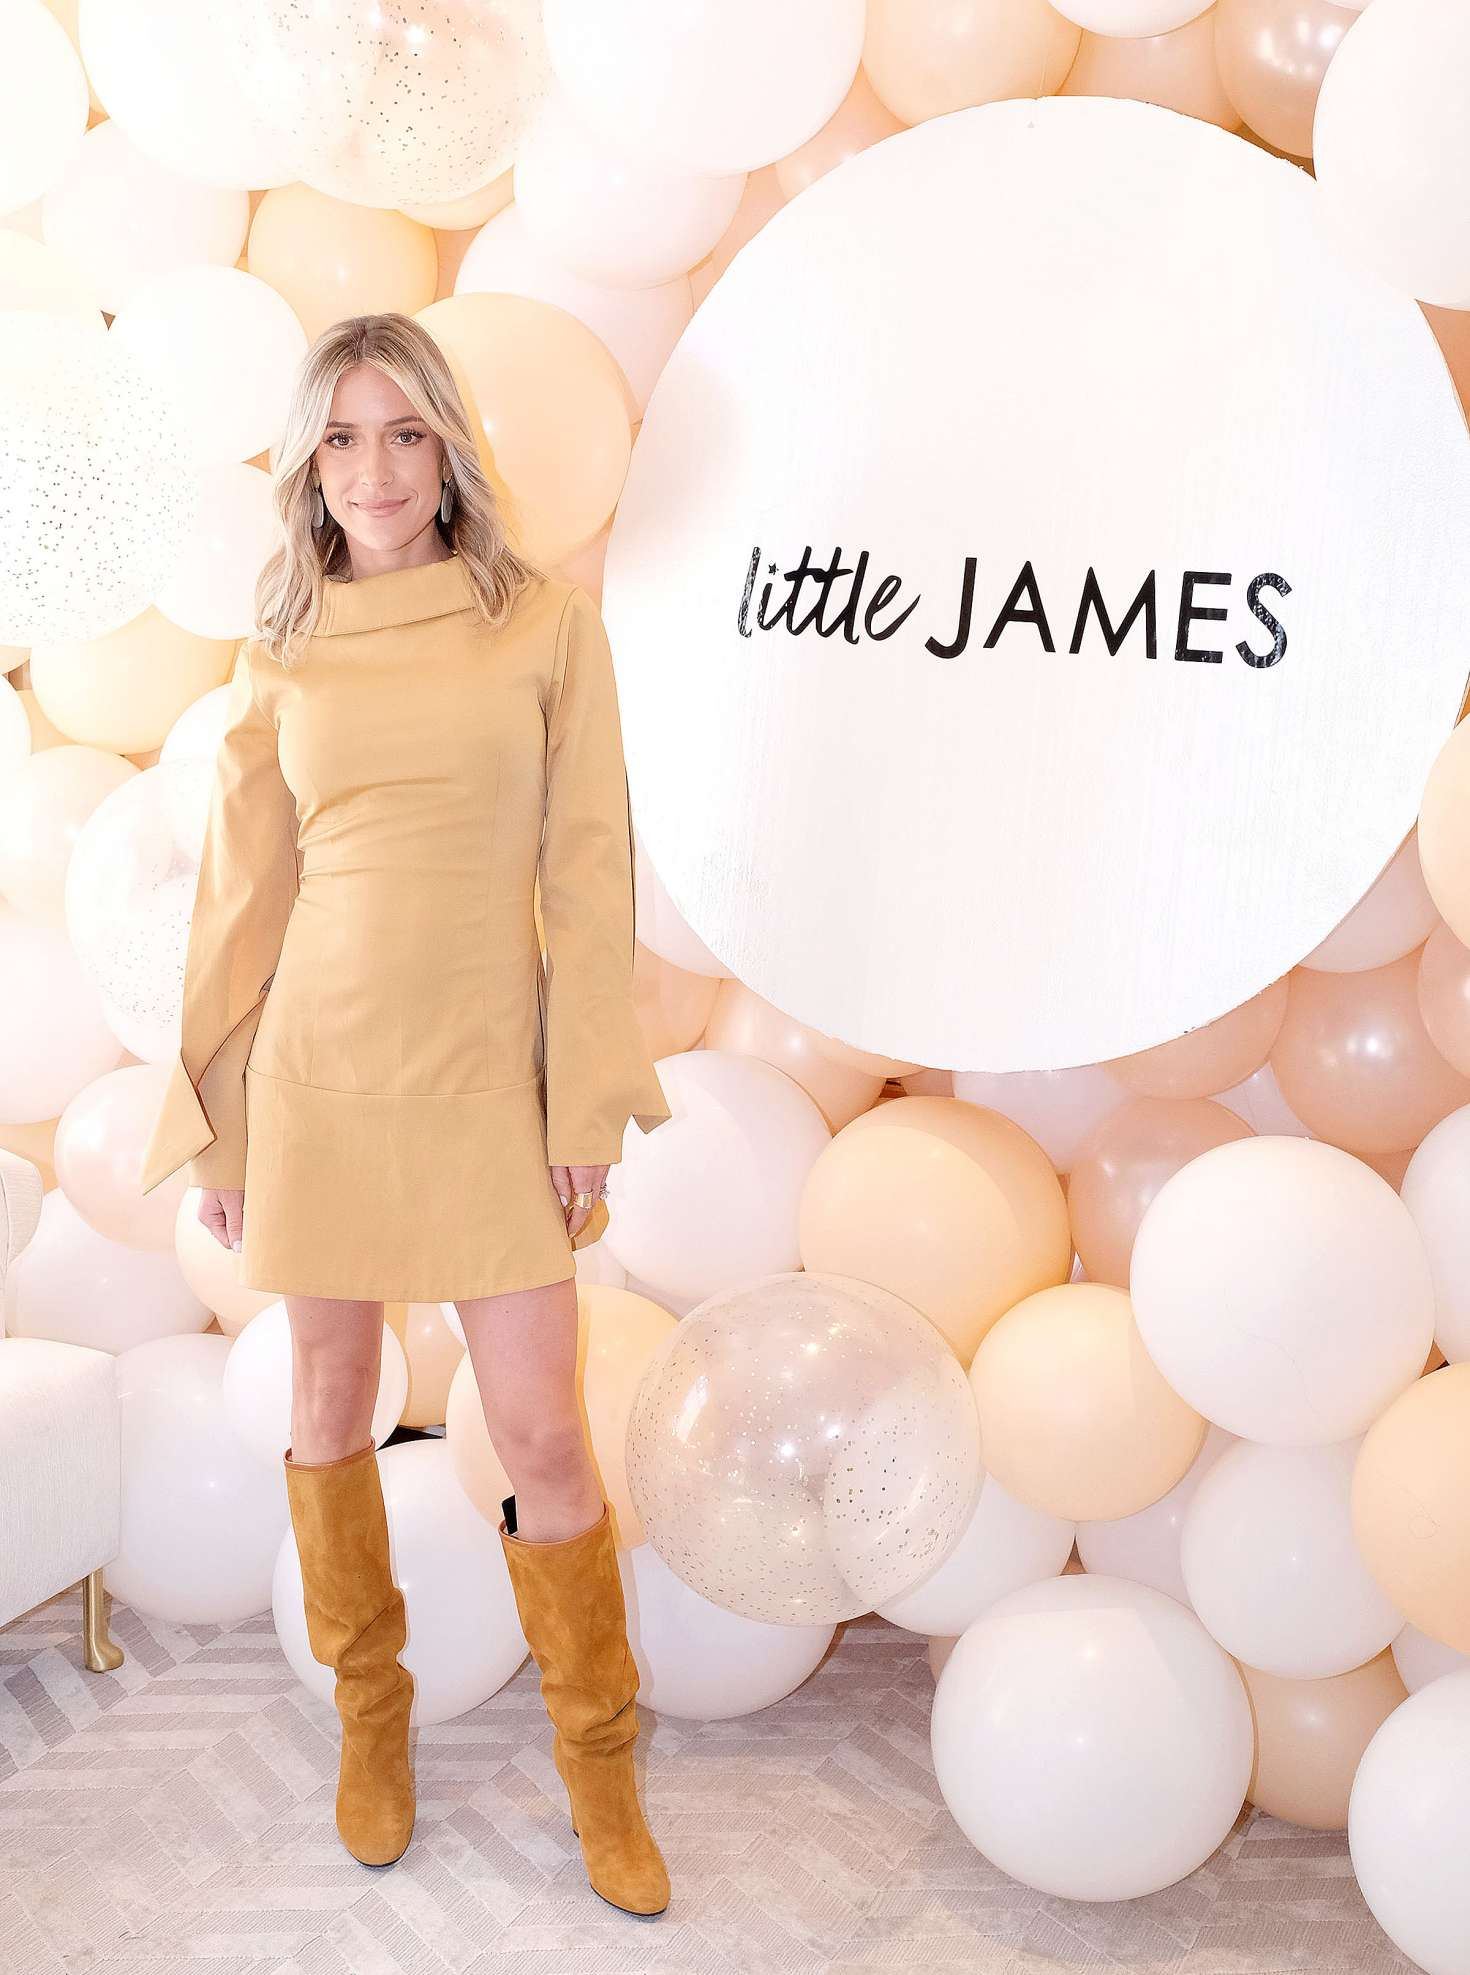 Kristin Cavallari - Little James Pop-up Shop Launch in Pacific Palisades